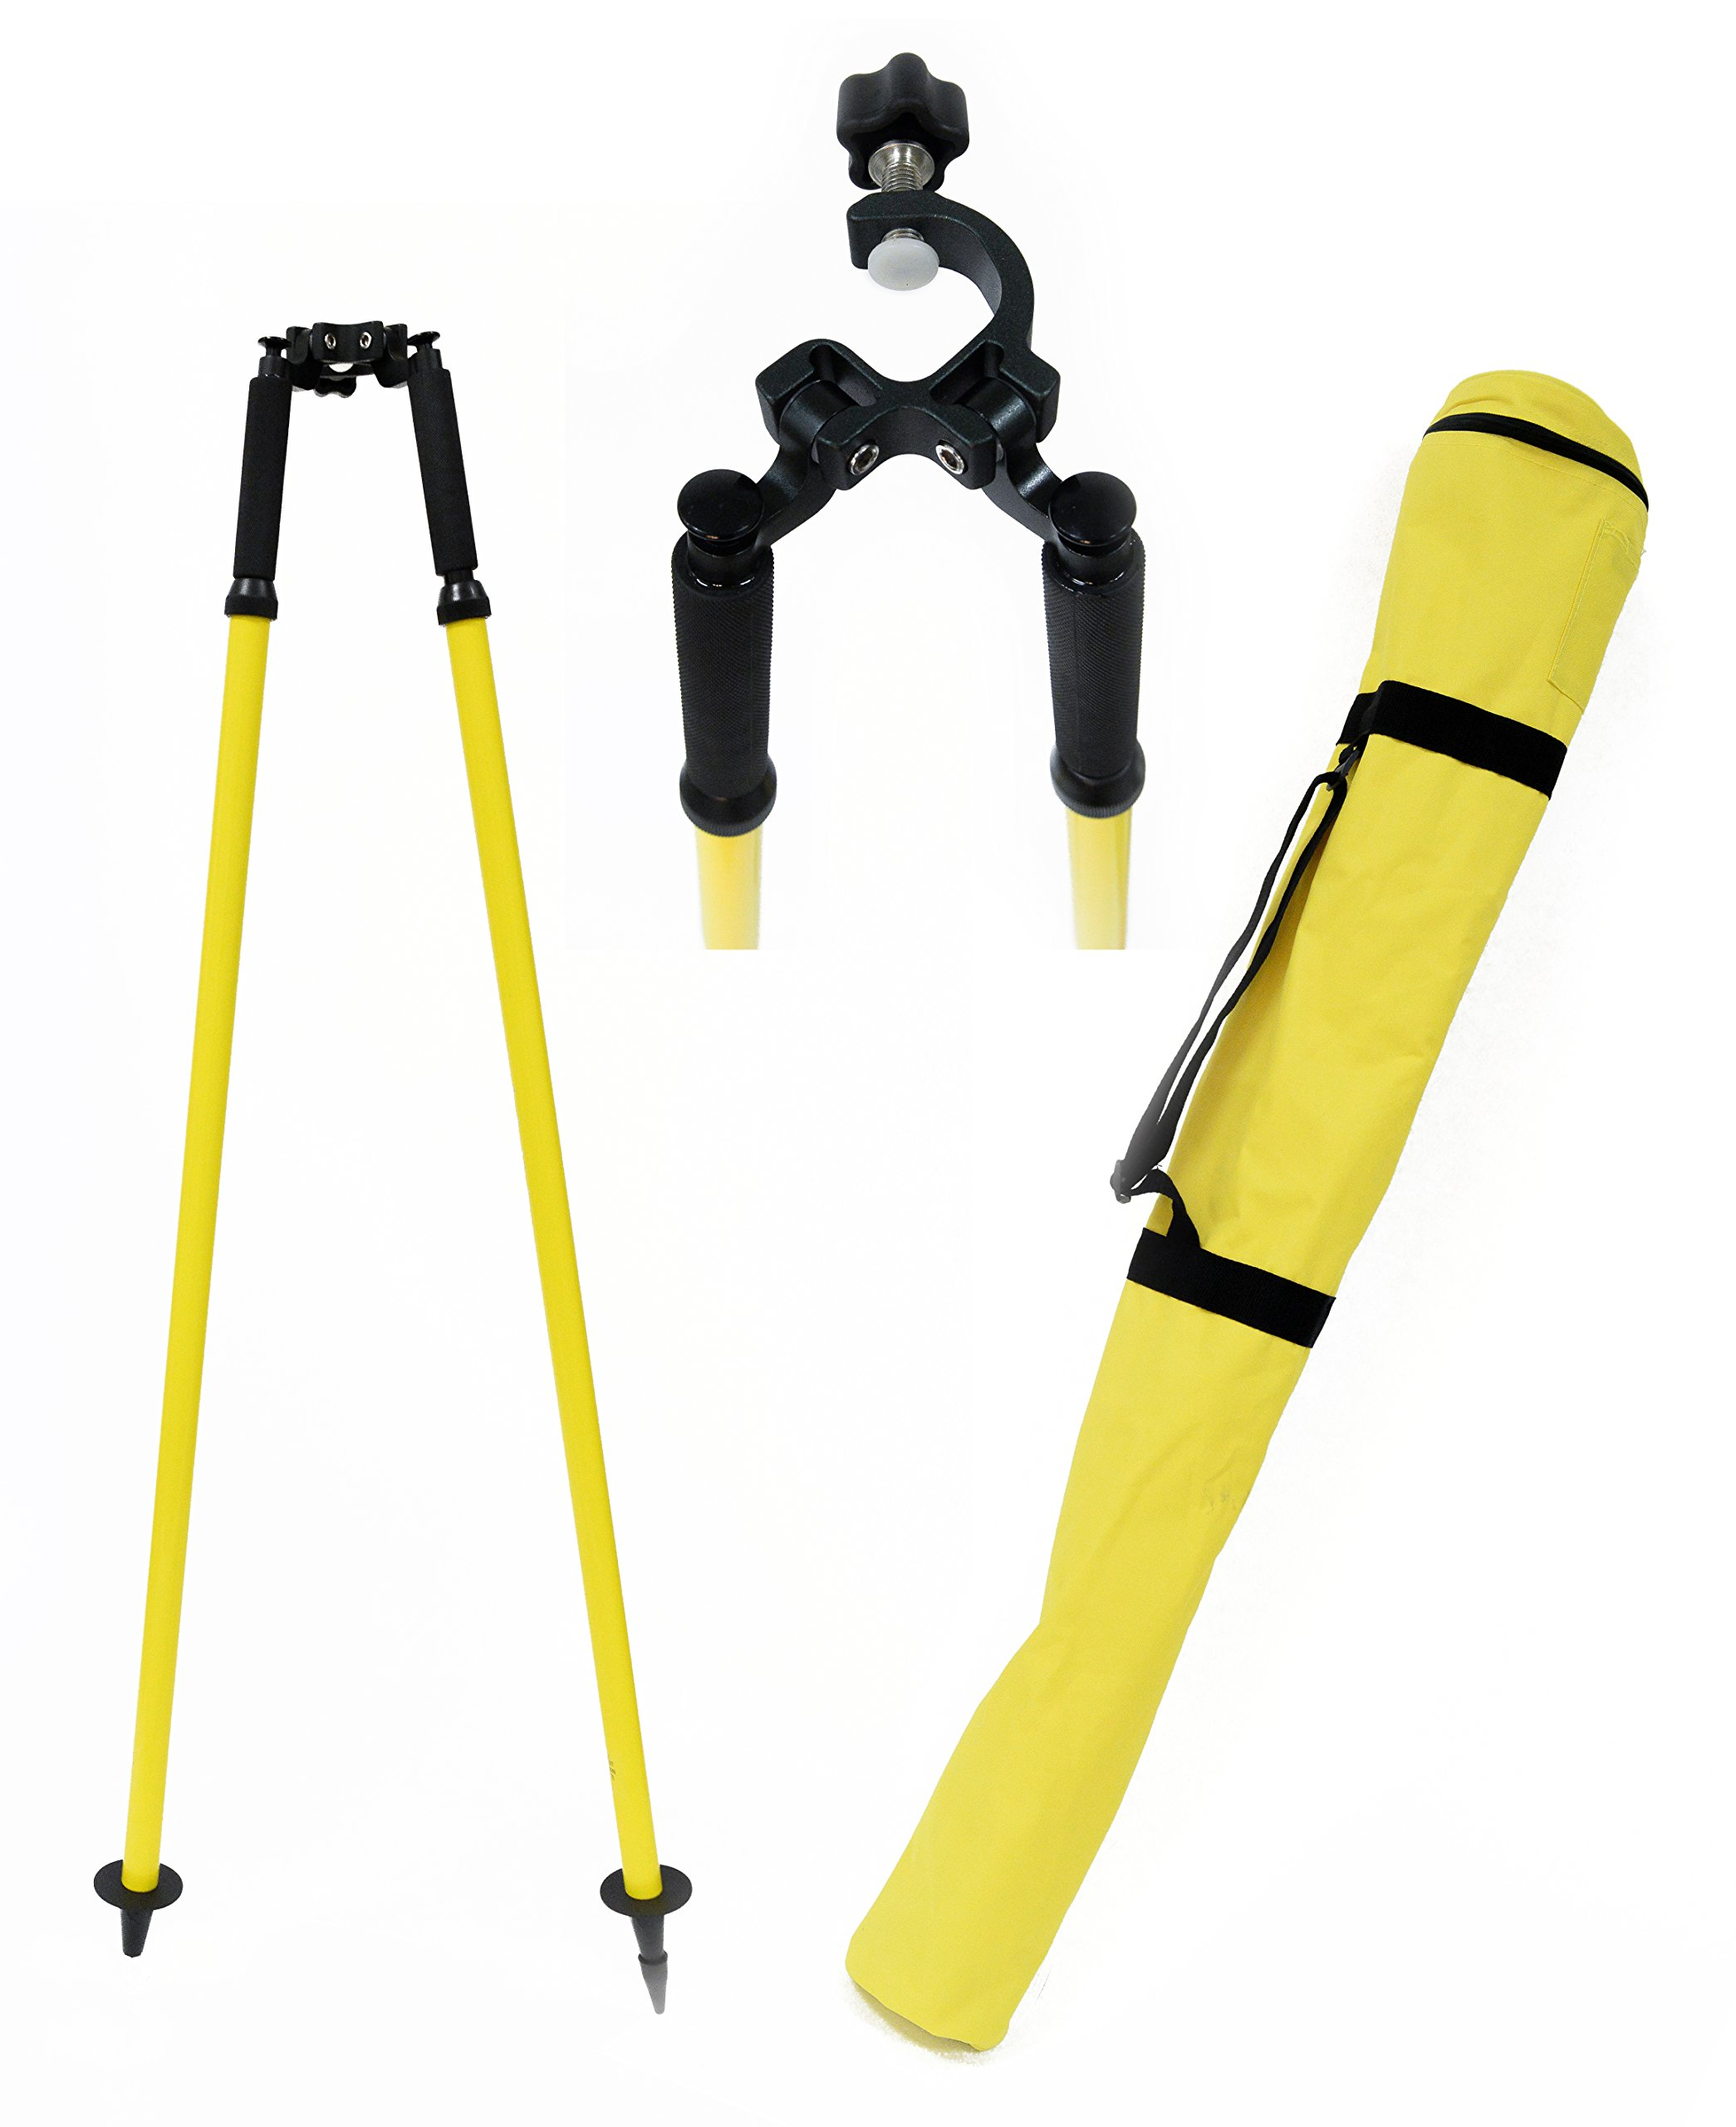 AdirPro Prism Pole Bipod (Yellow) by AdirPro